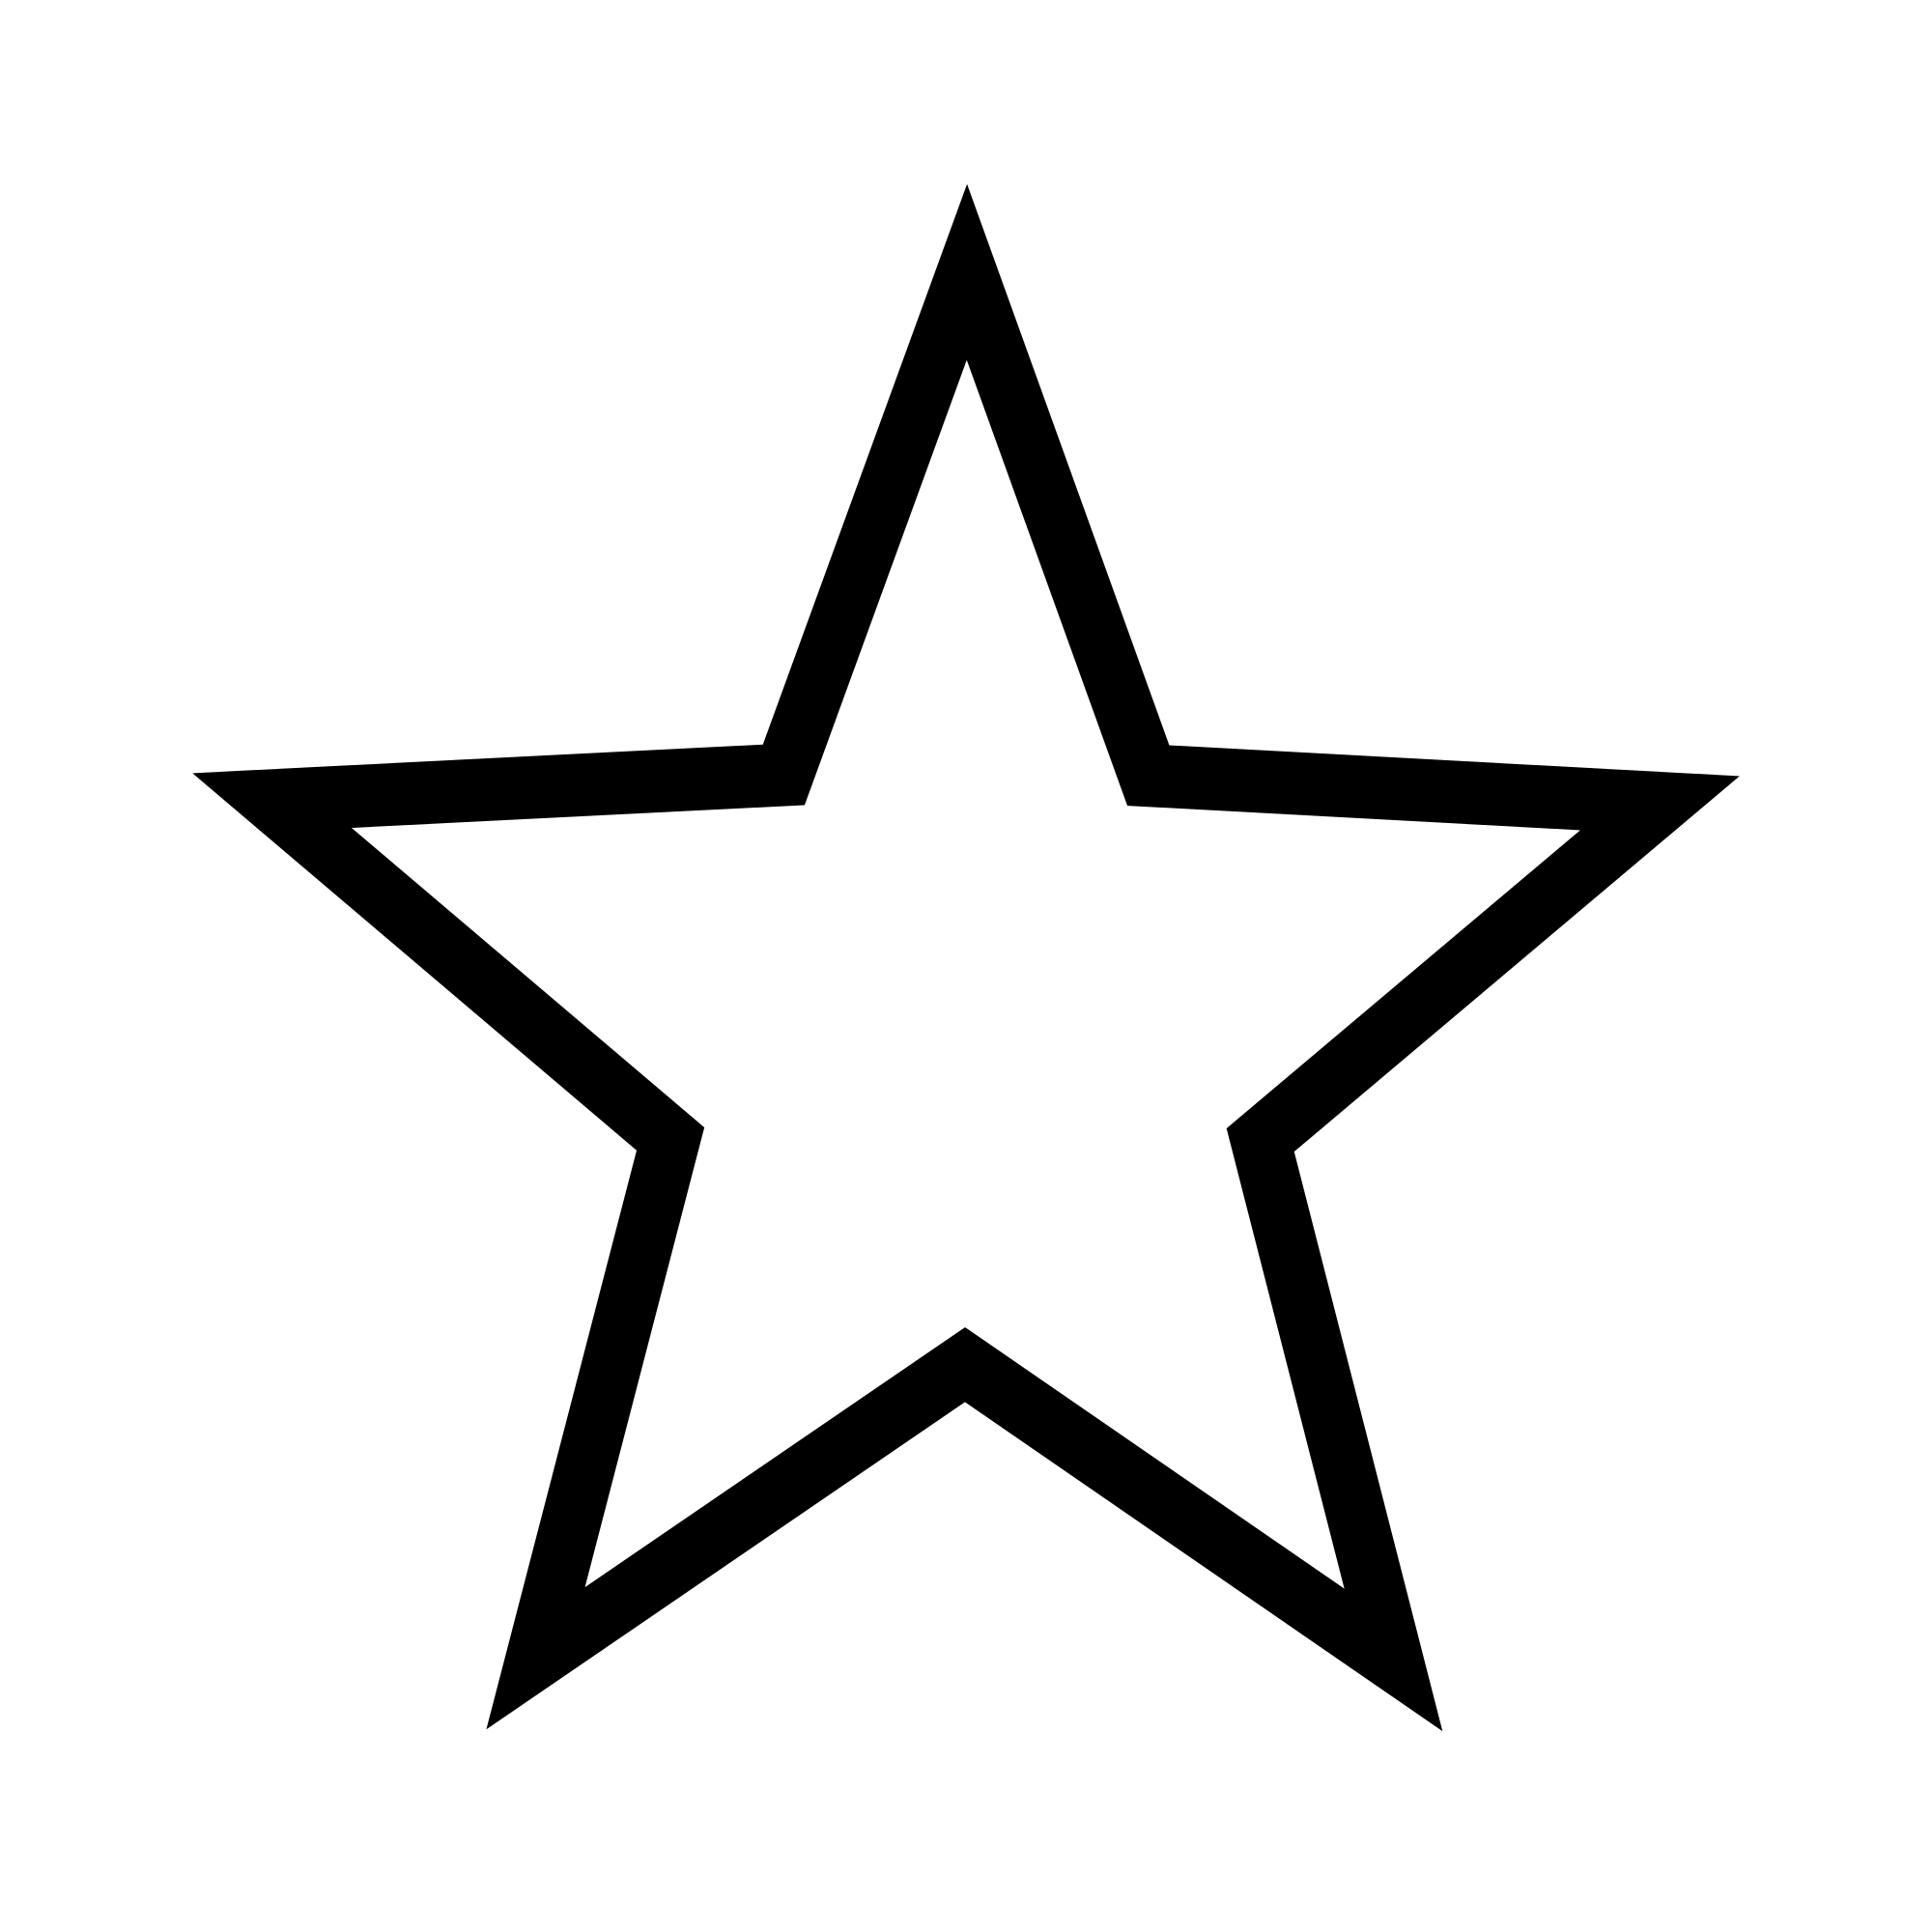 Transparent White Star - ClipArt Best